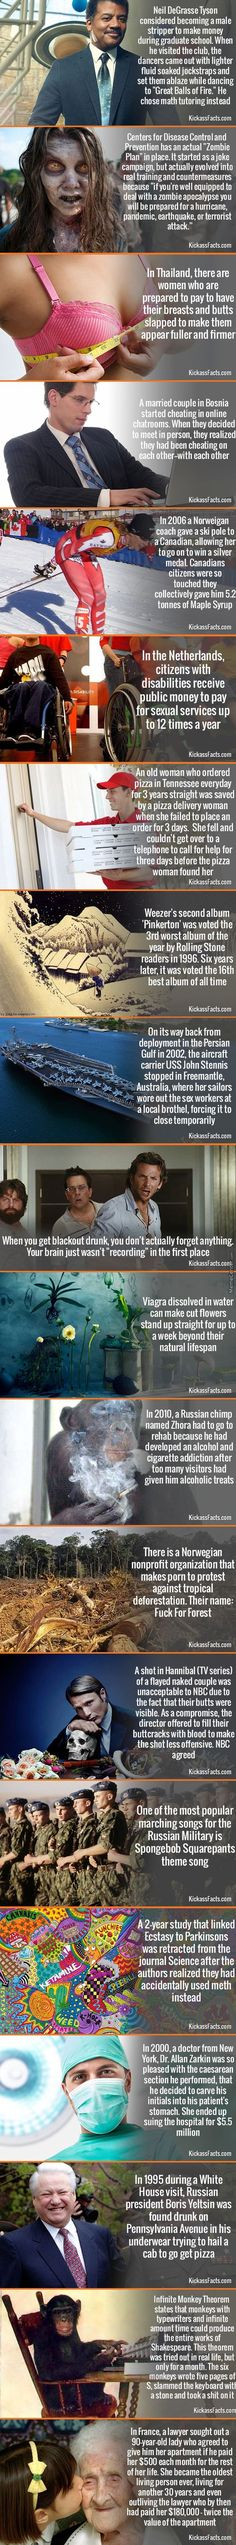 20 Amusing Facts Compilation - Part 3